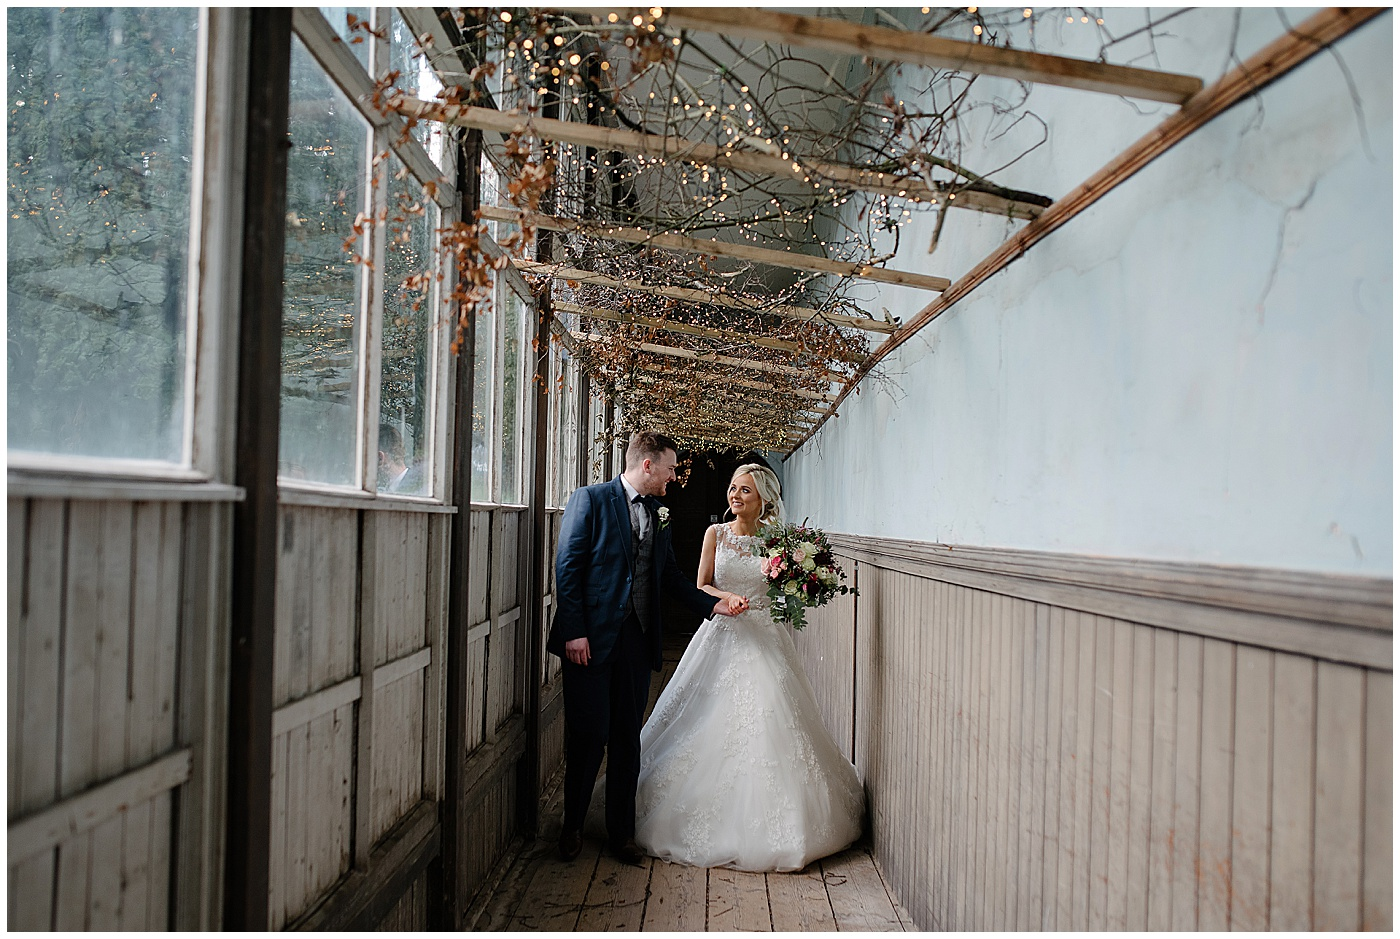 lissan-house-wedding-jude-browne-photography_0080.jpg